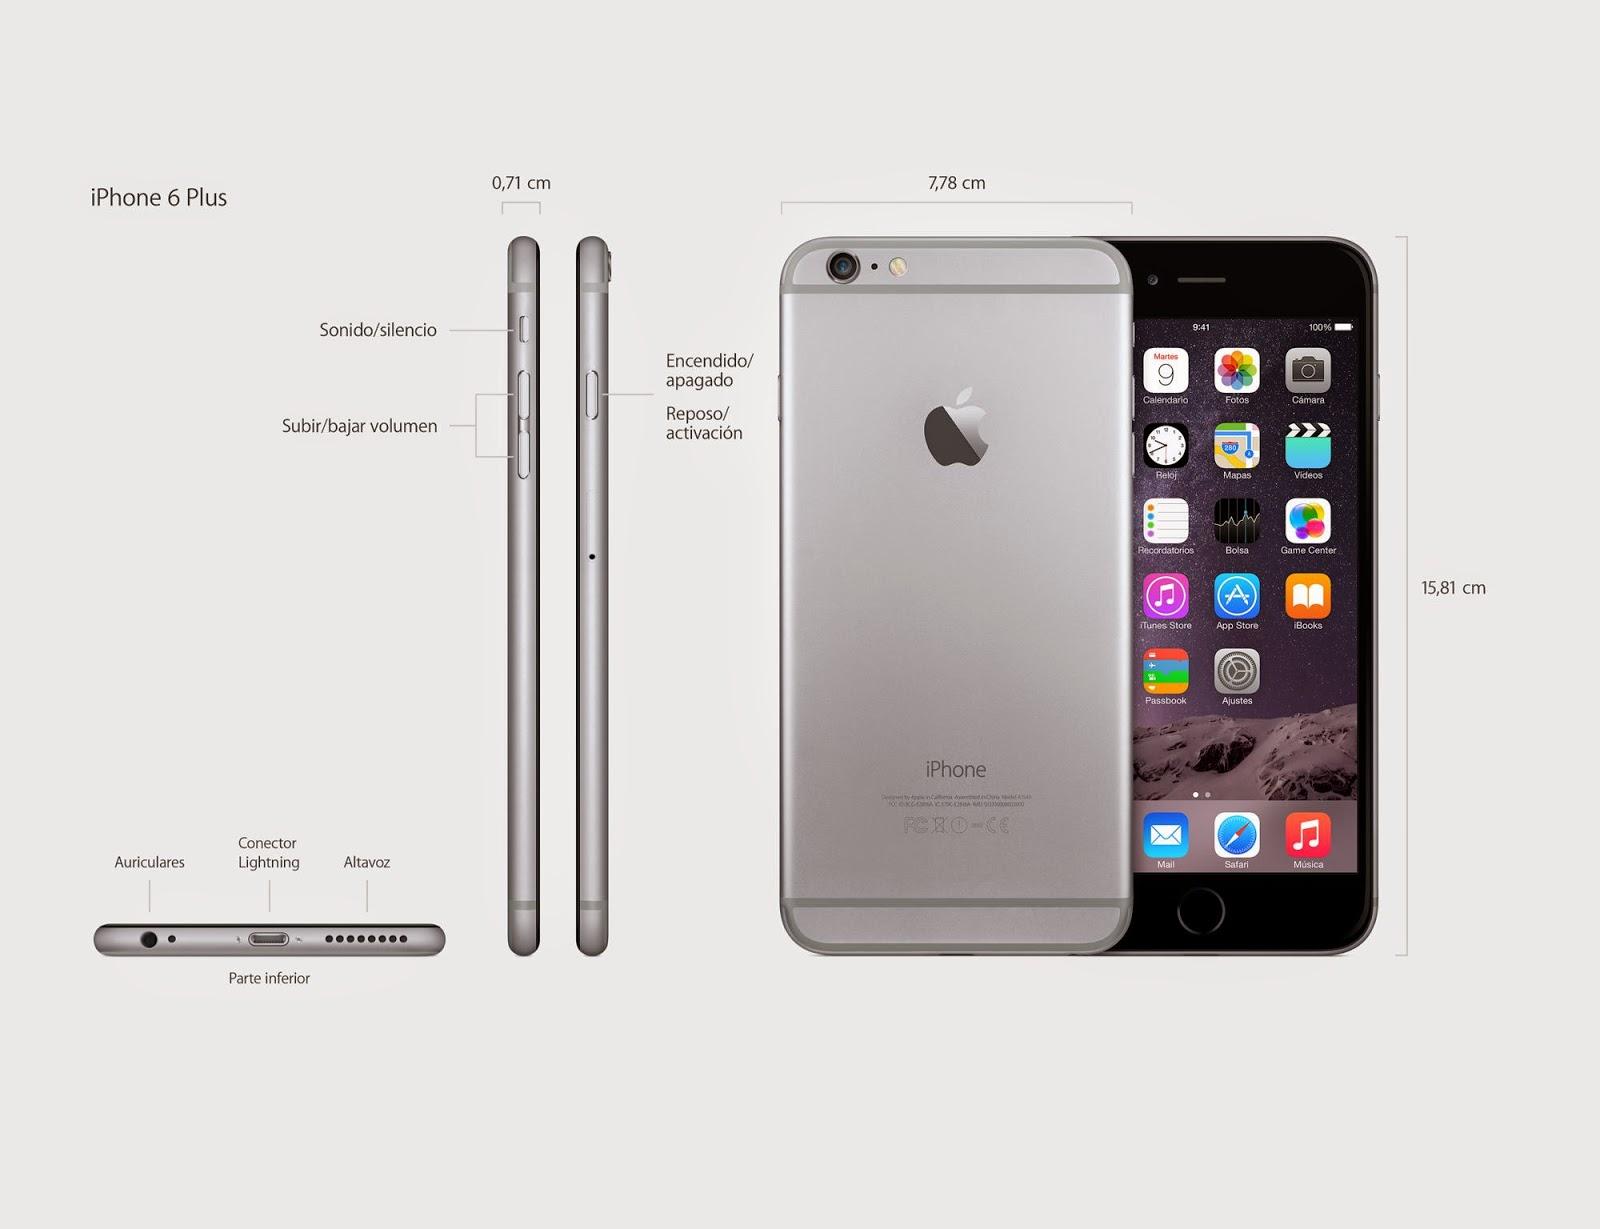 iPhone 5 Vægt